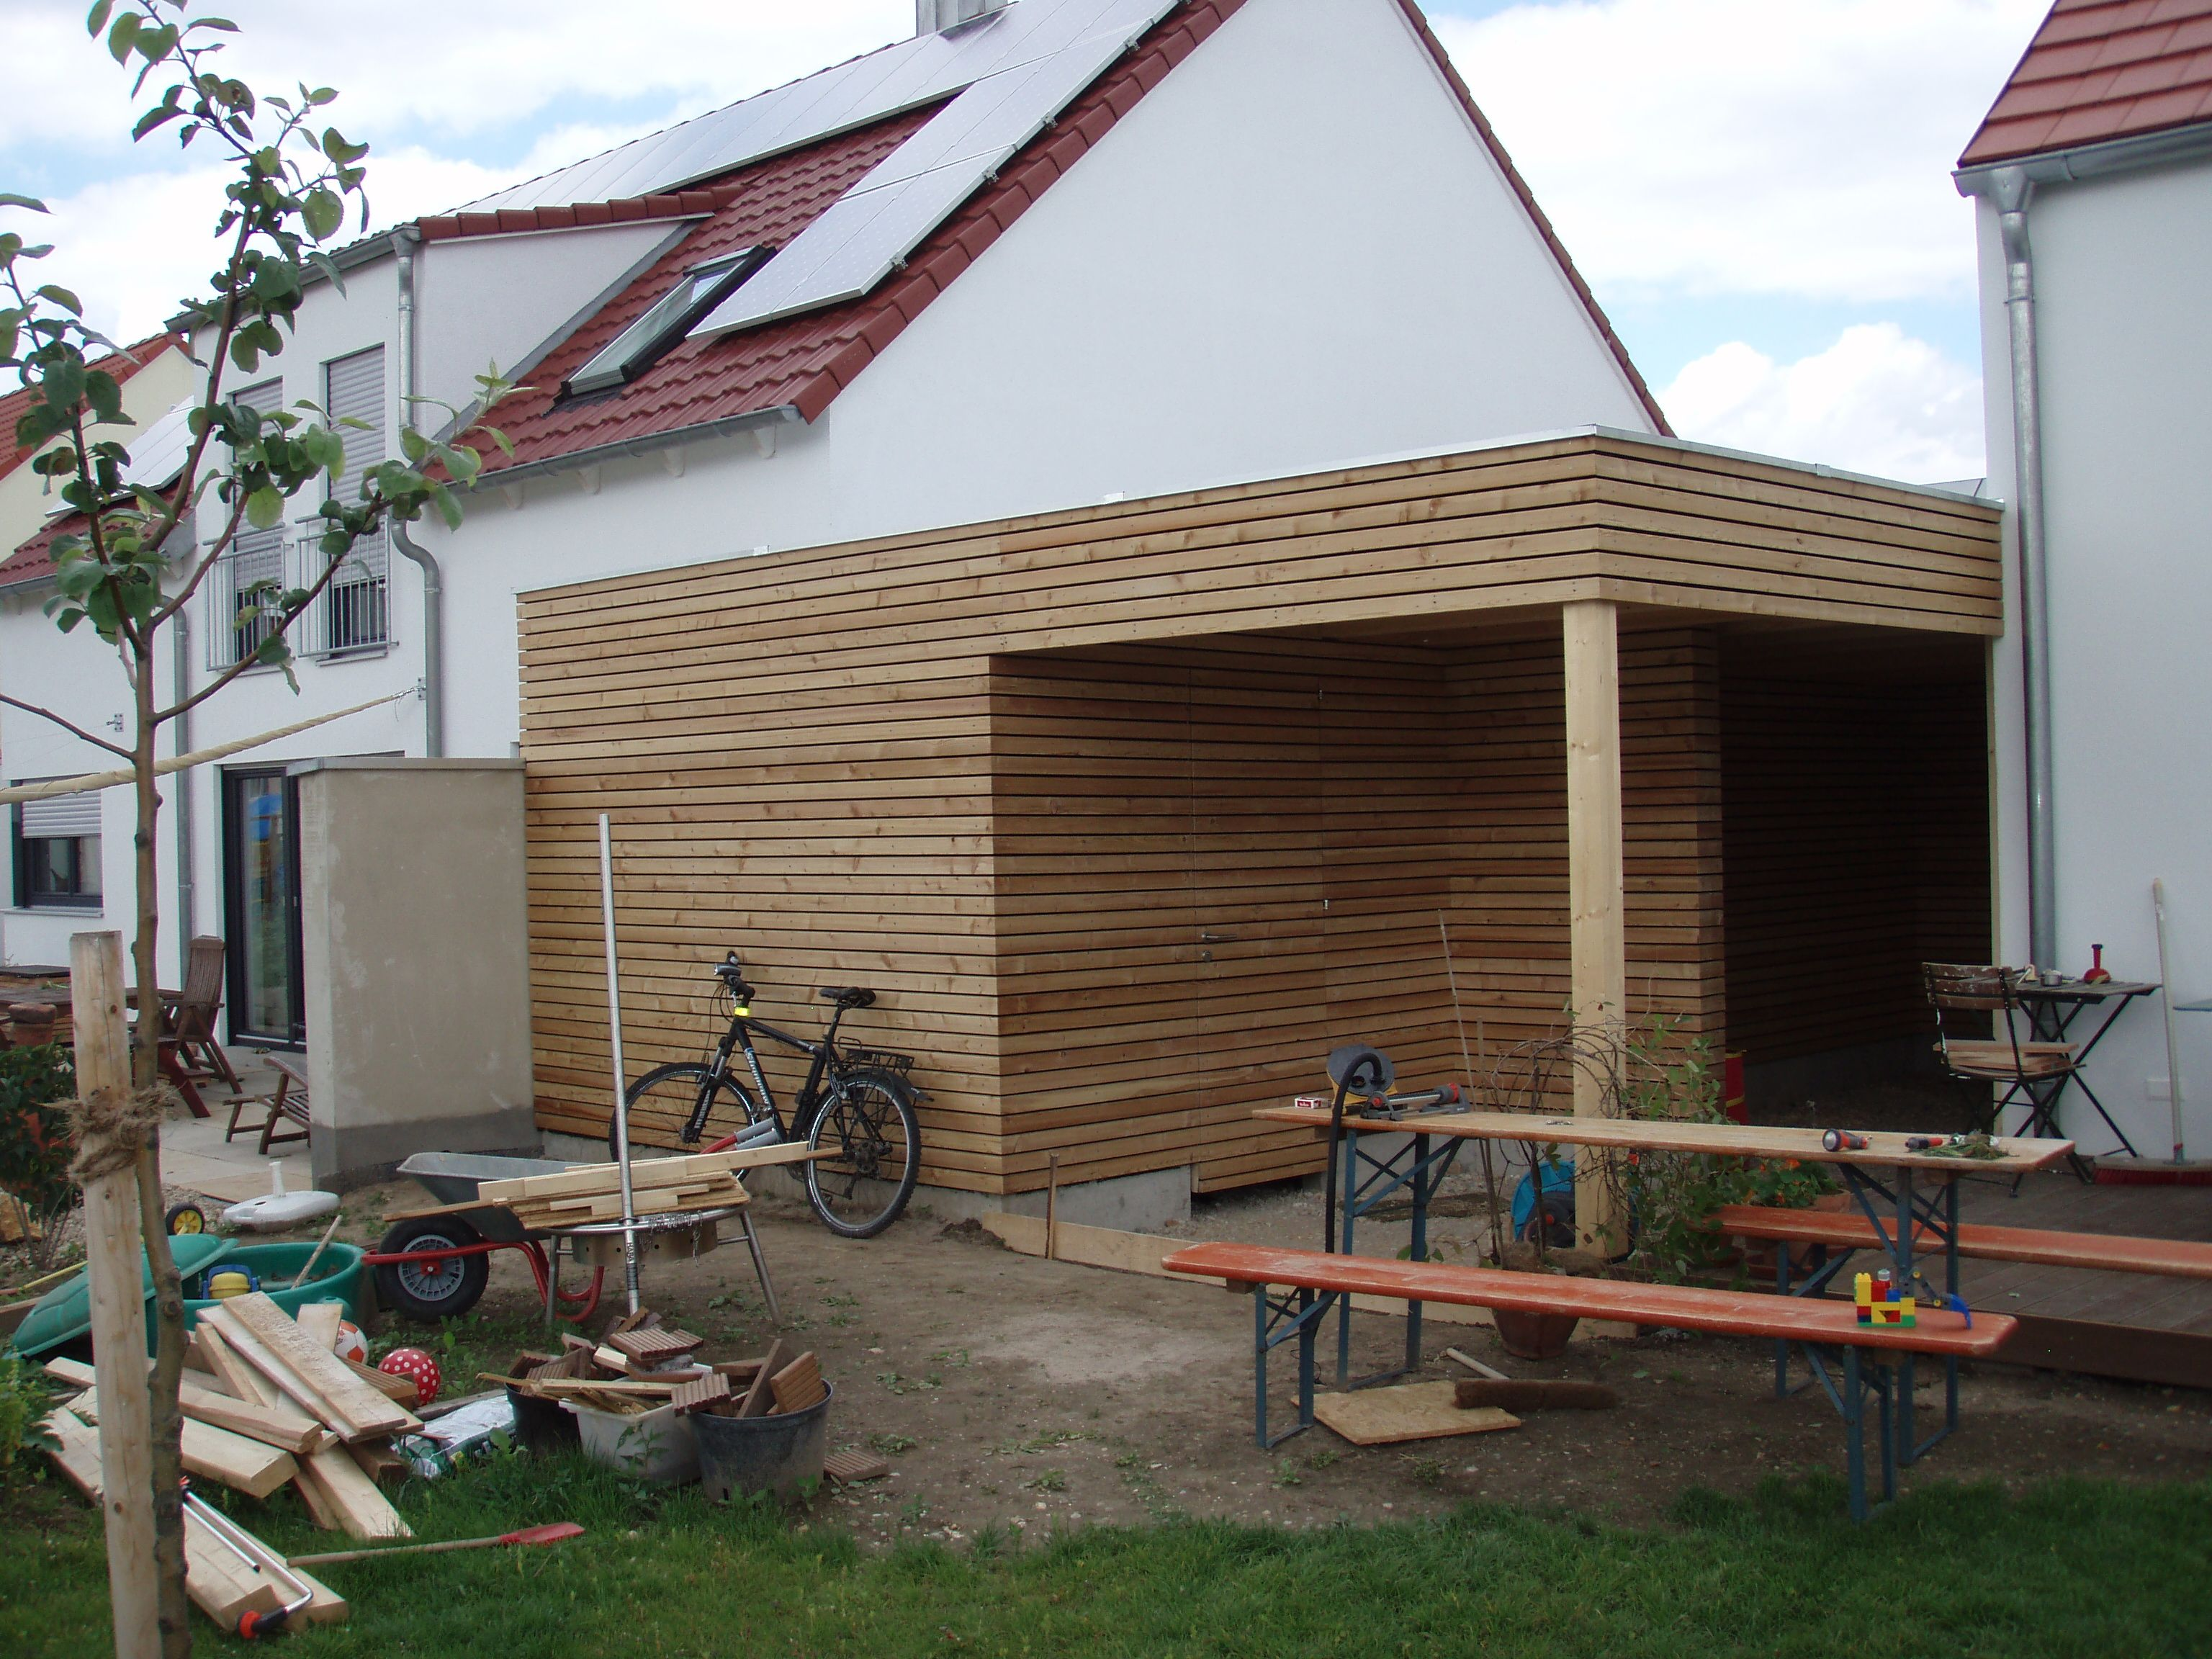 chiemgau werkstatt carport in regensburg outdoor pinterest regensburg. Black Bedroom Furniture Sets. Home Design Ideas